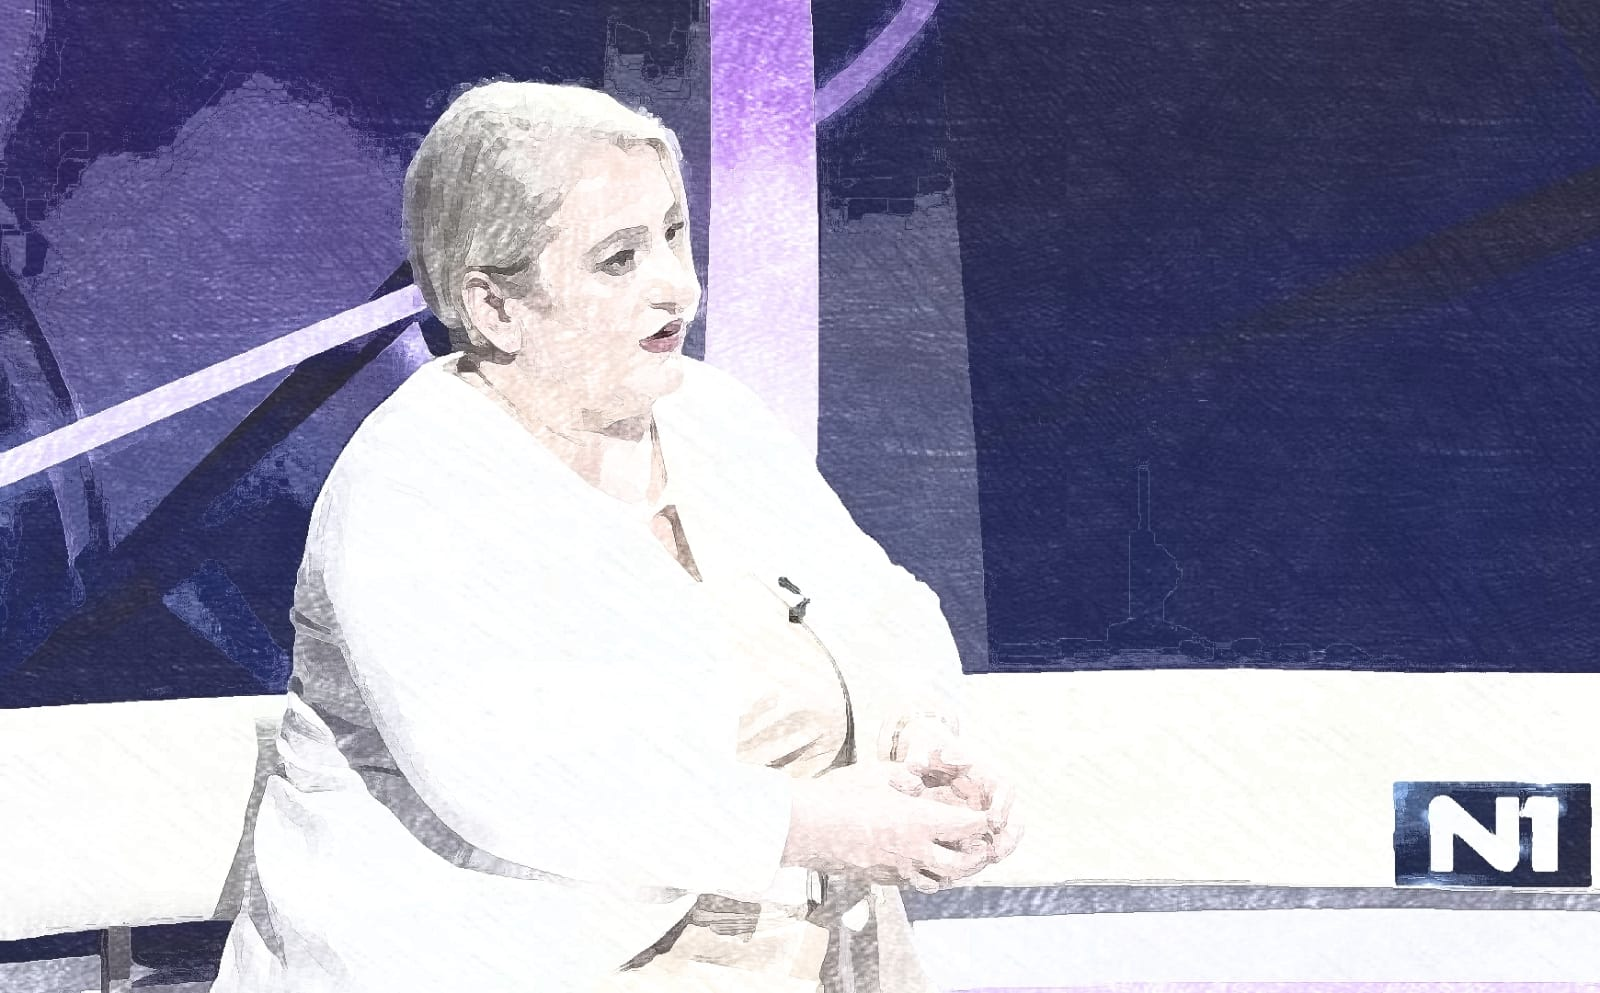 Diana Zelenika